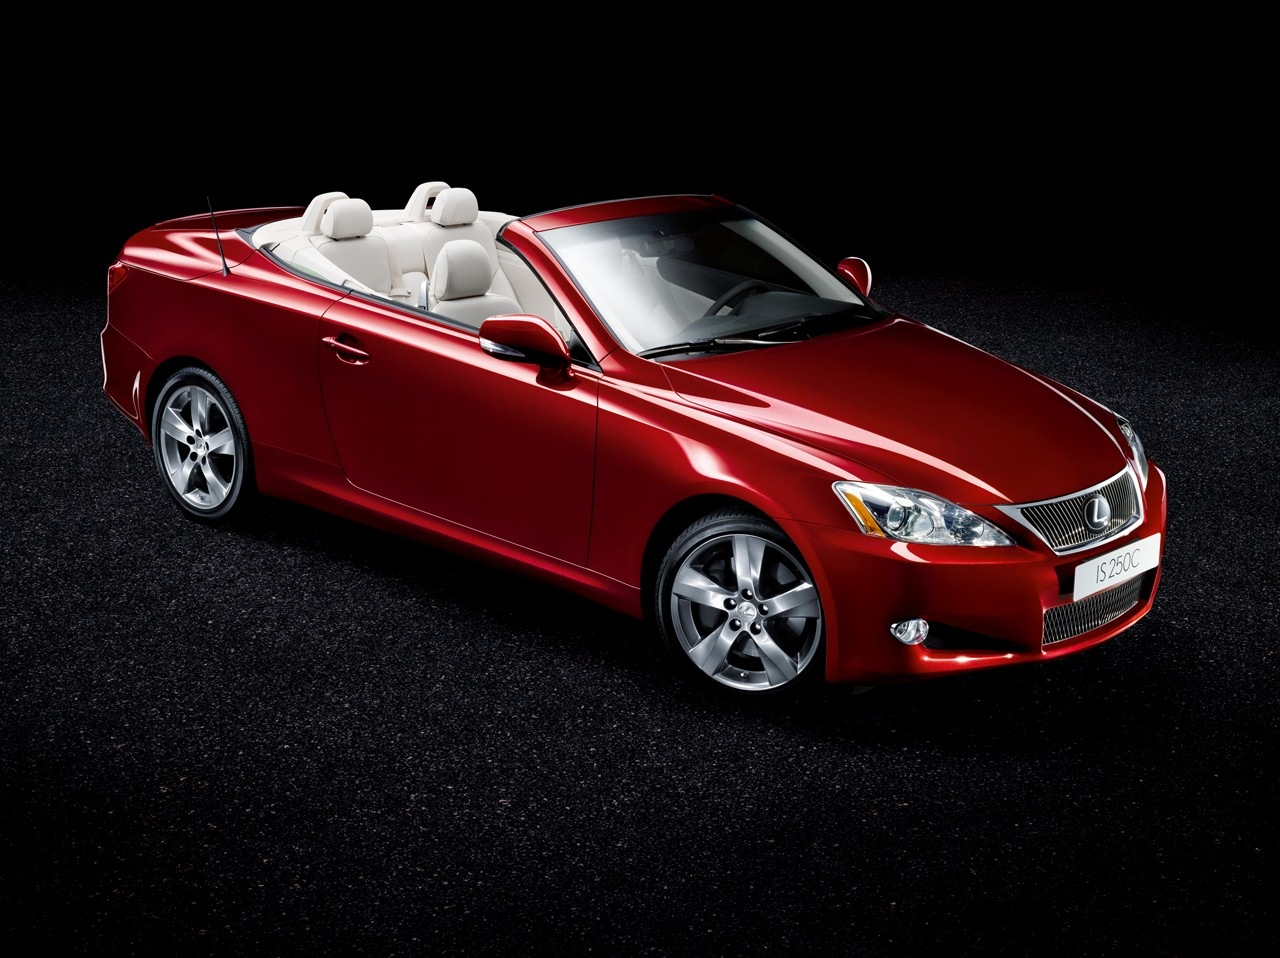 lexus is 250c convertible cars wallpaper. Black Bedroom Furniture Sets. Home Design Ideas